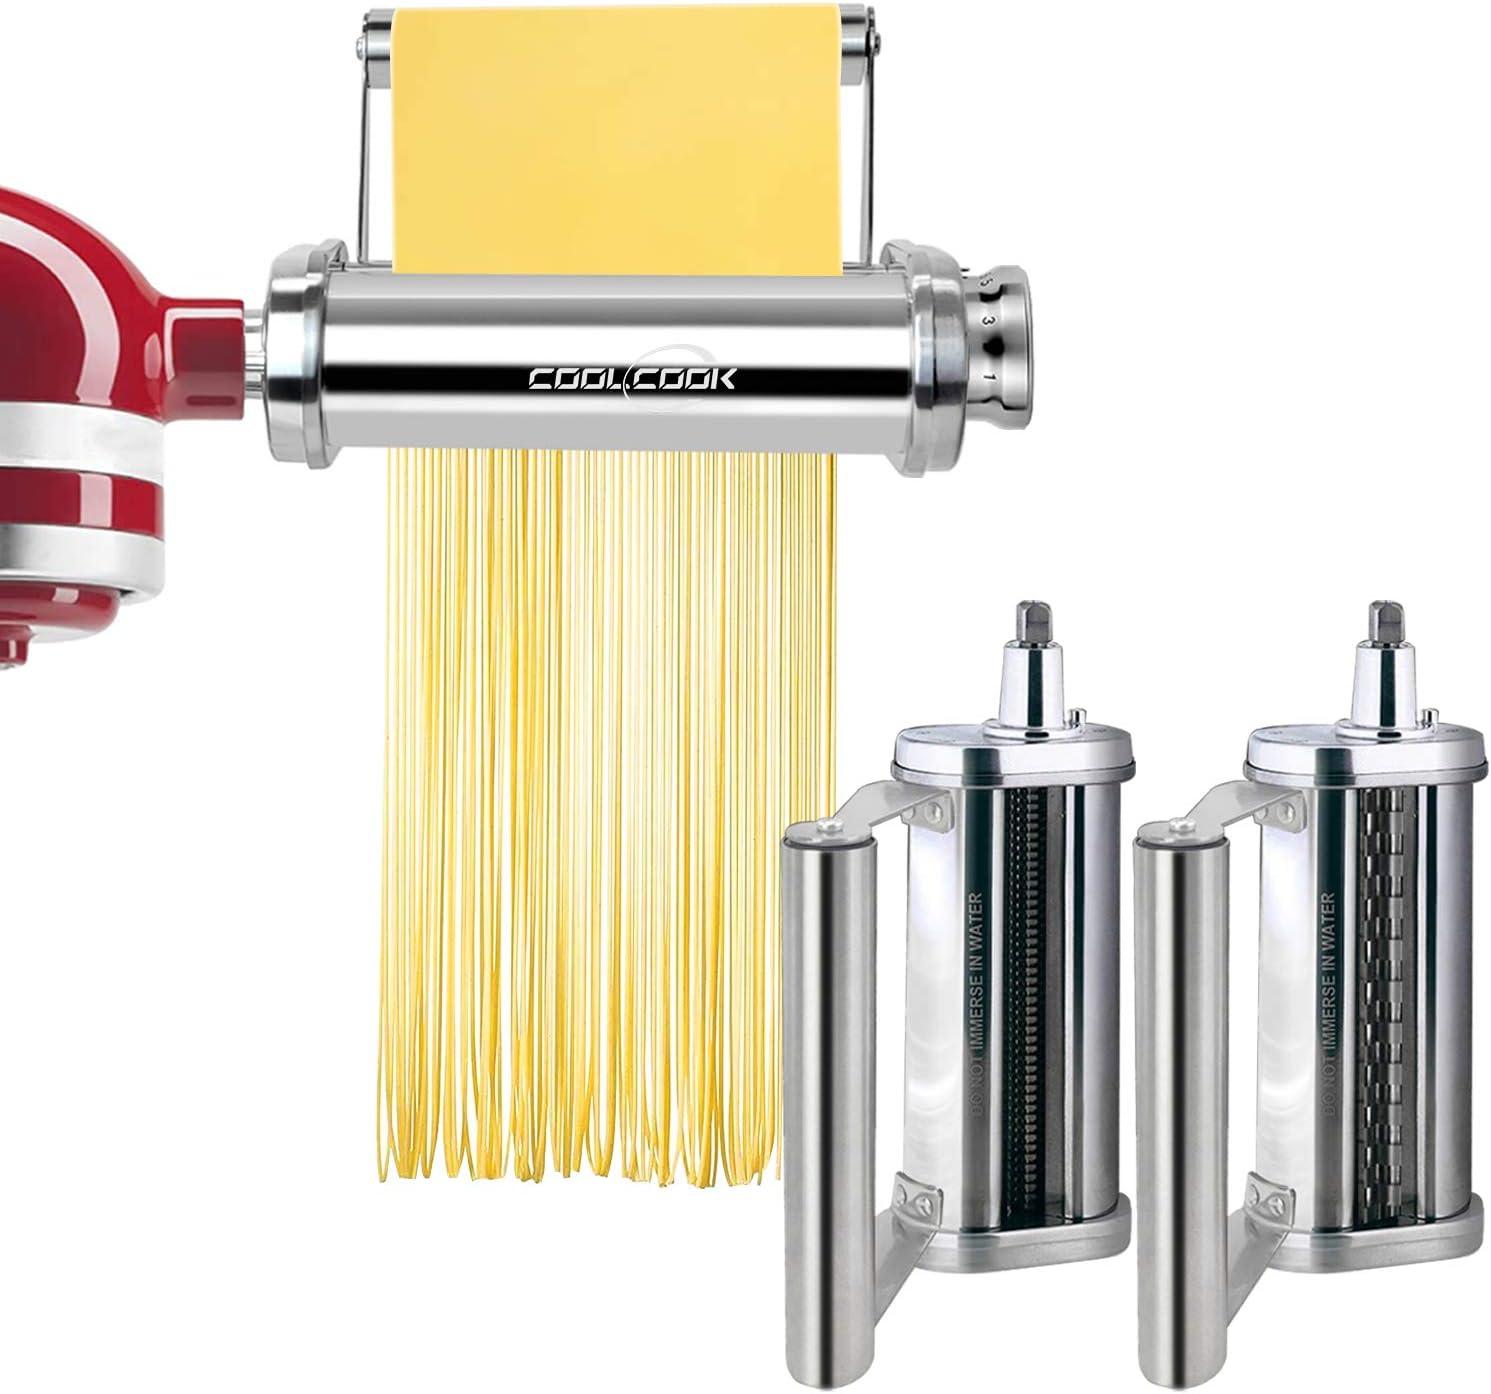 Pasta Maker Attachment Set for KitchenAid Stand Mixer with Uniqu